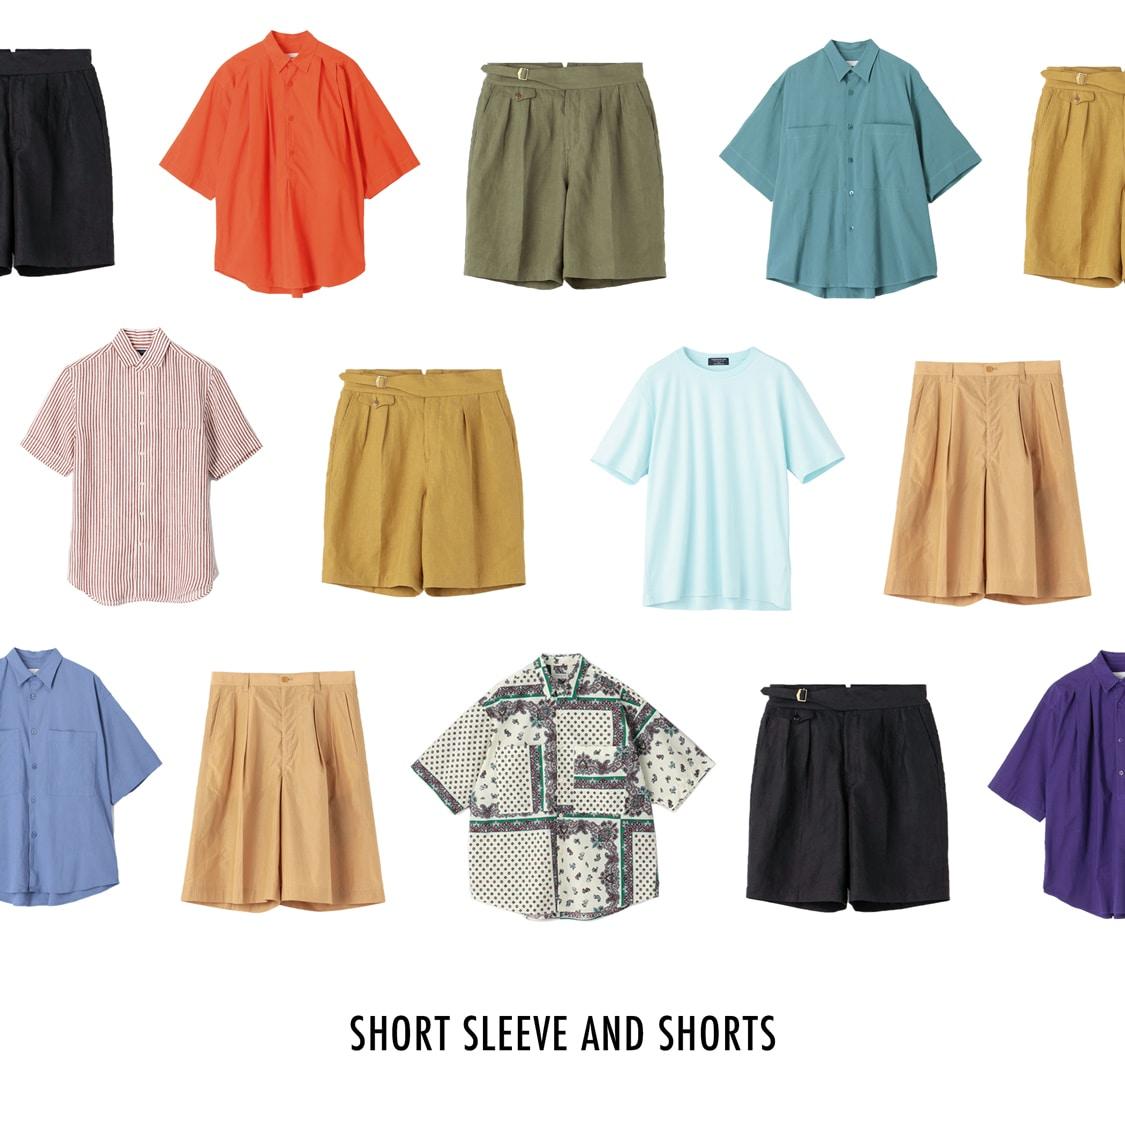 SHORT SLEEVE AND SHORTS